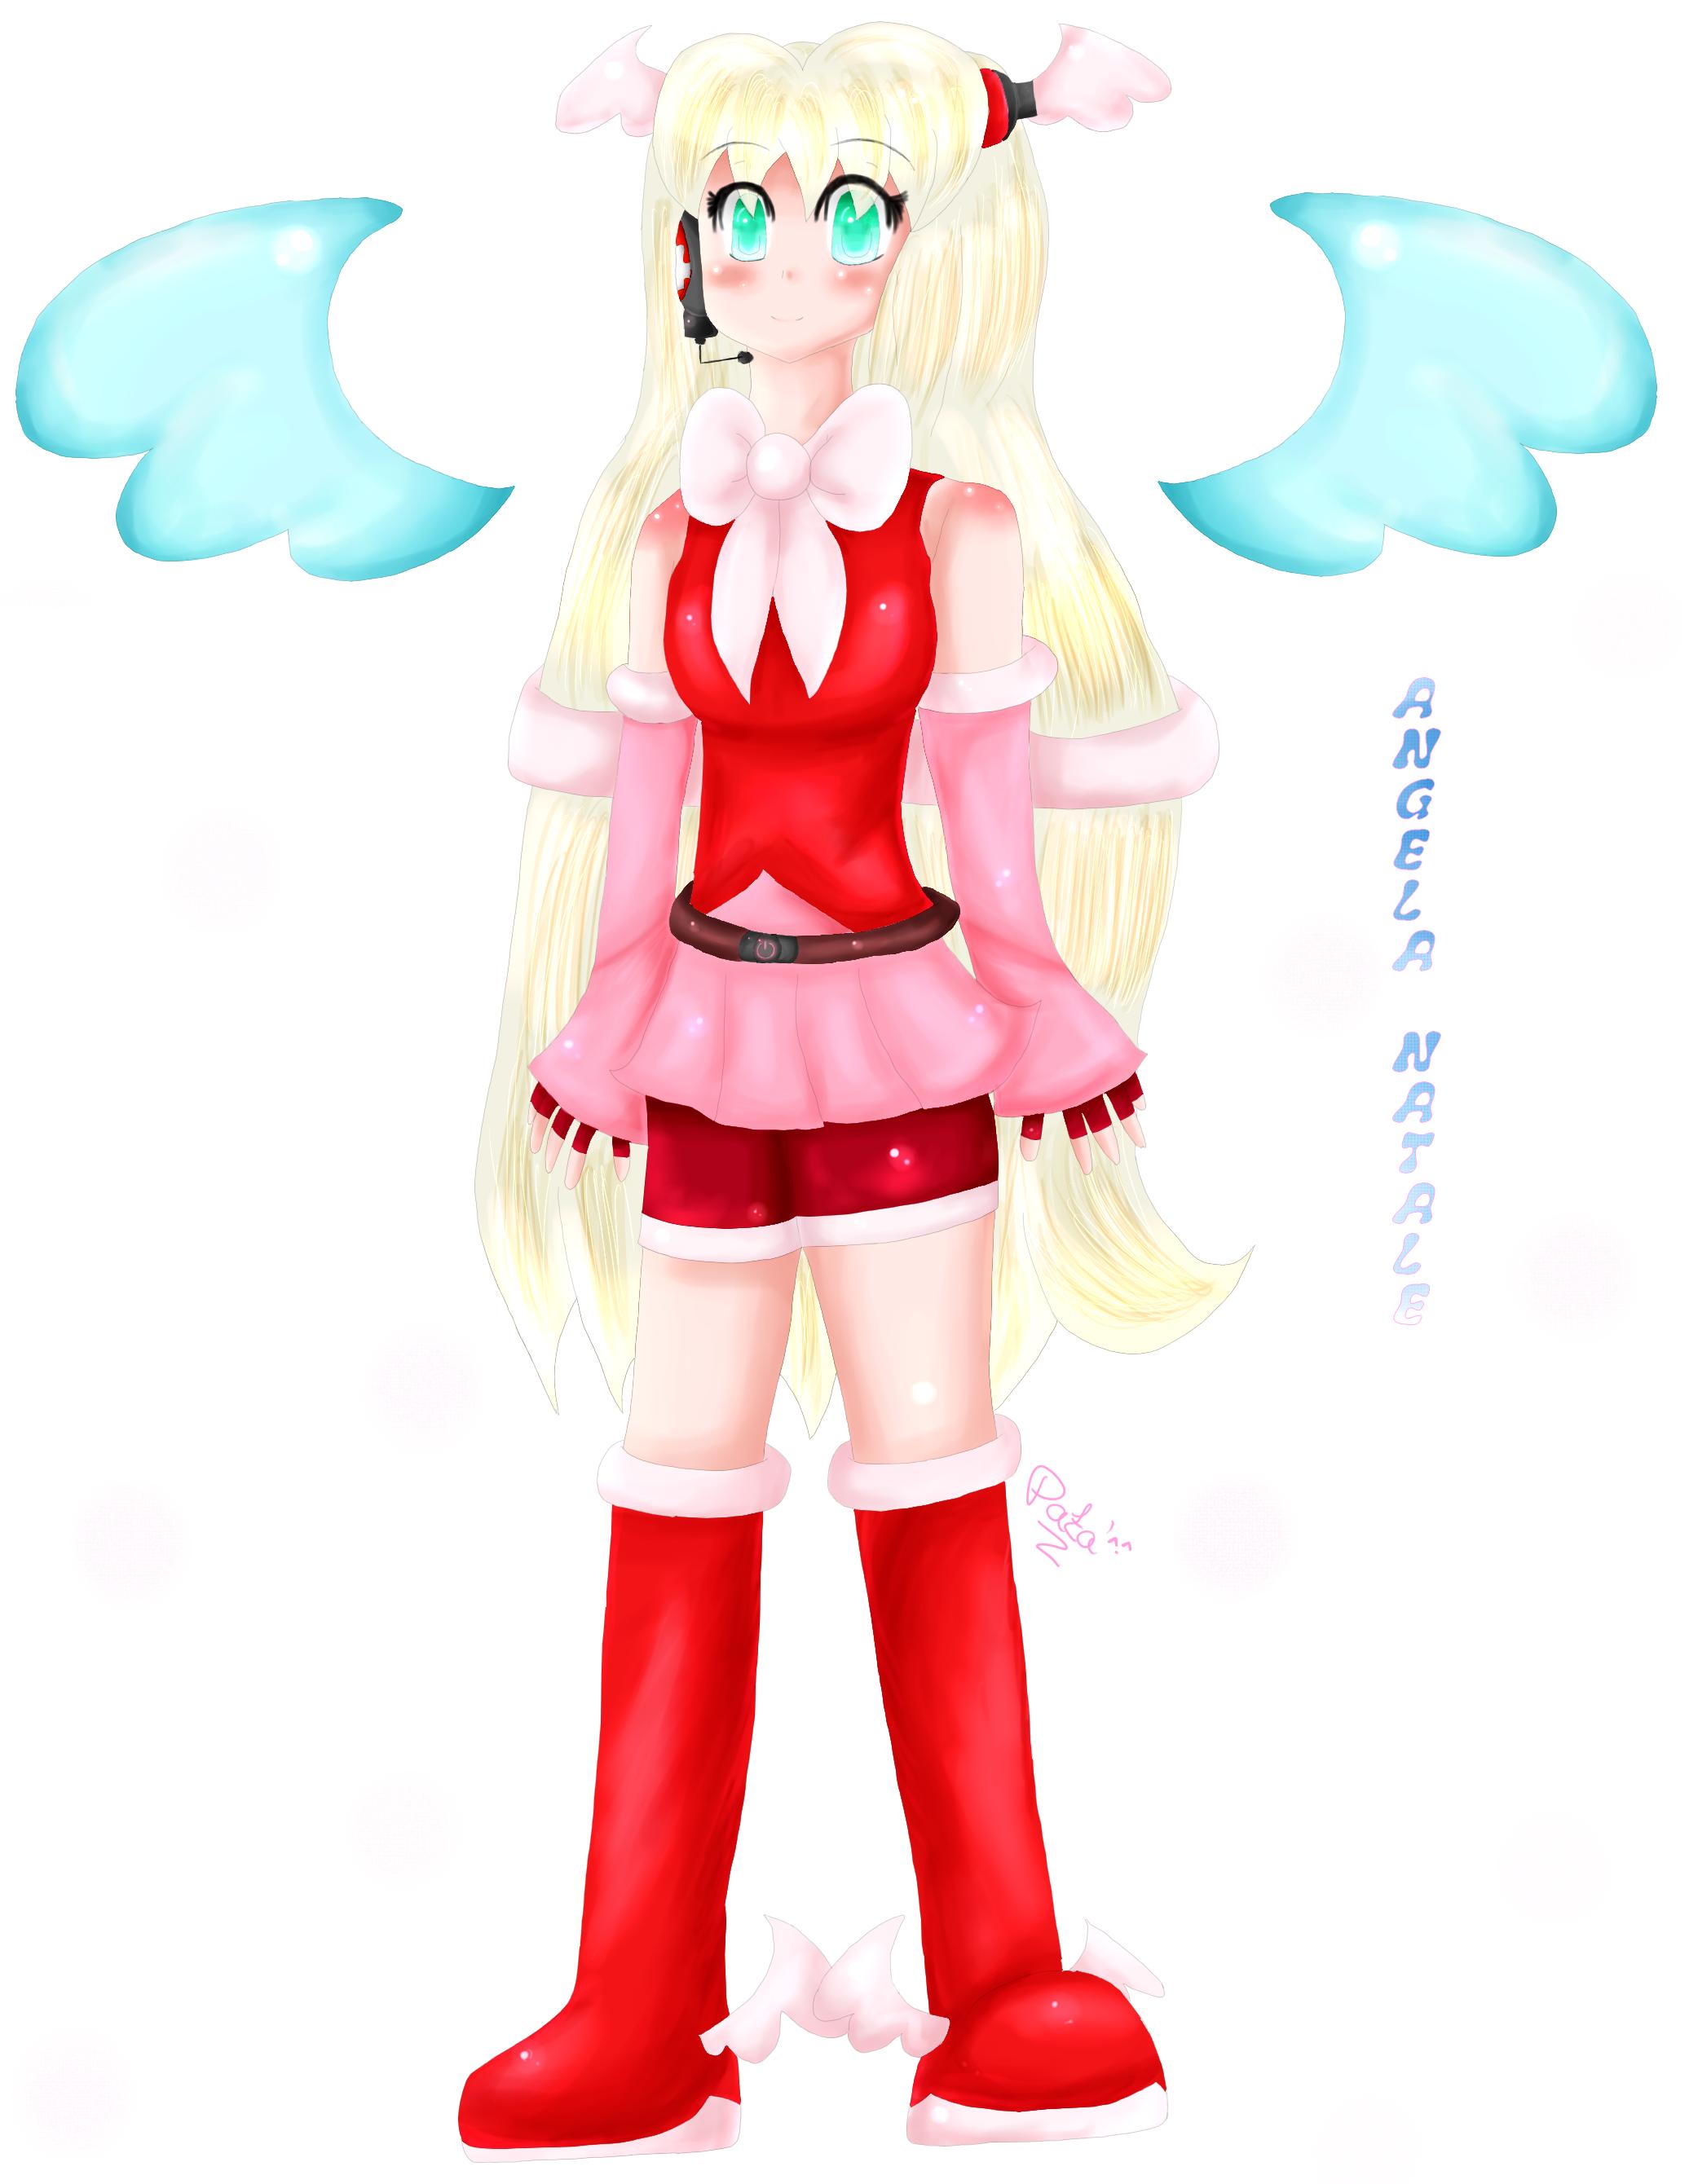 OC_Vocaloid : Angela_Natale by AquaPatamon